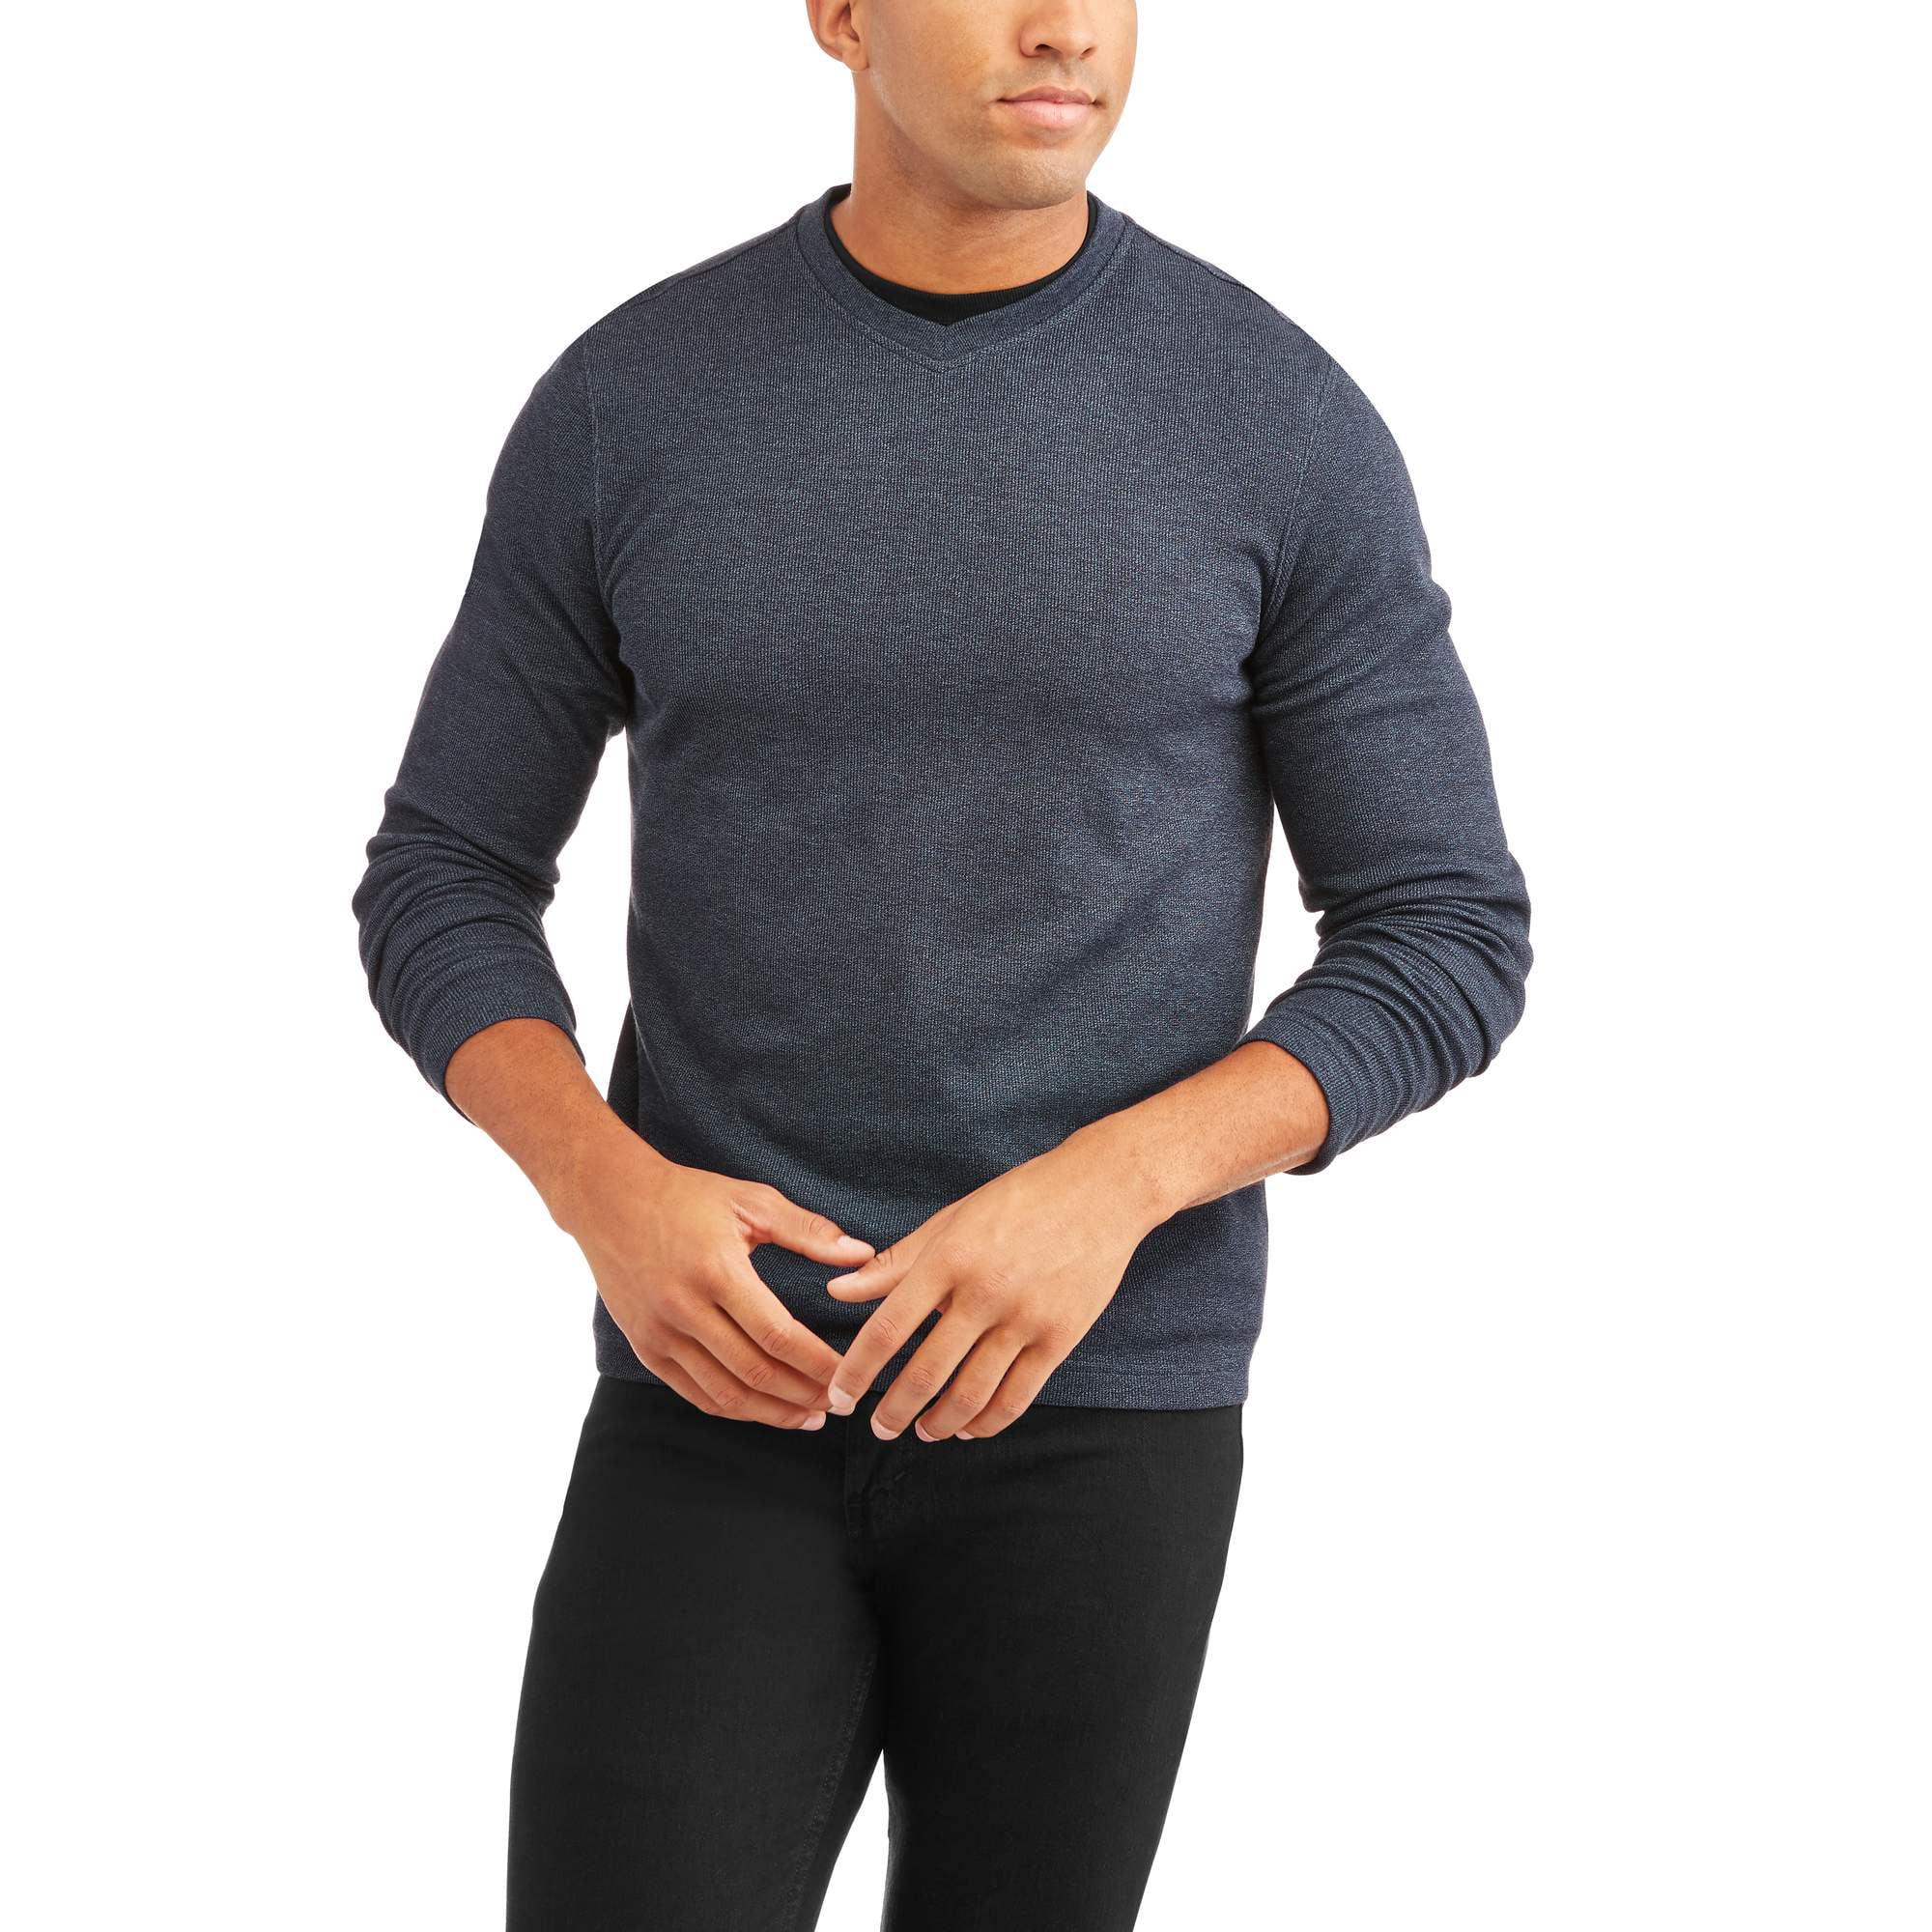 608599f6 Walmart Faded Glory Mens Long Sleeve Shirts